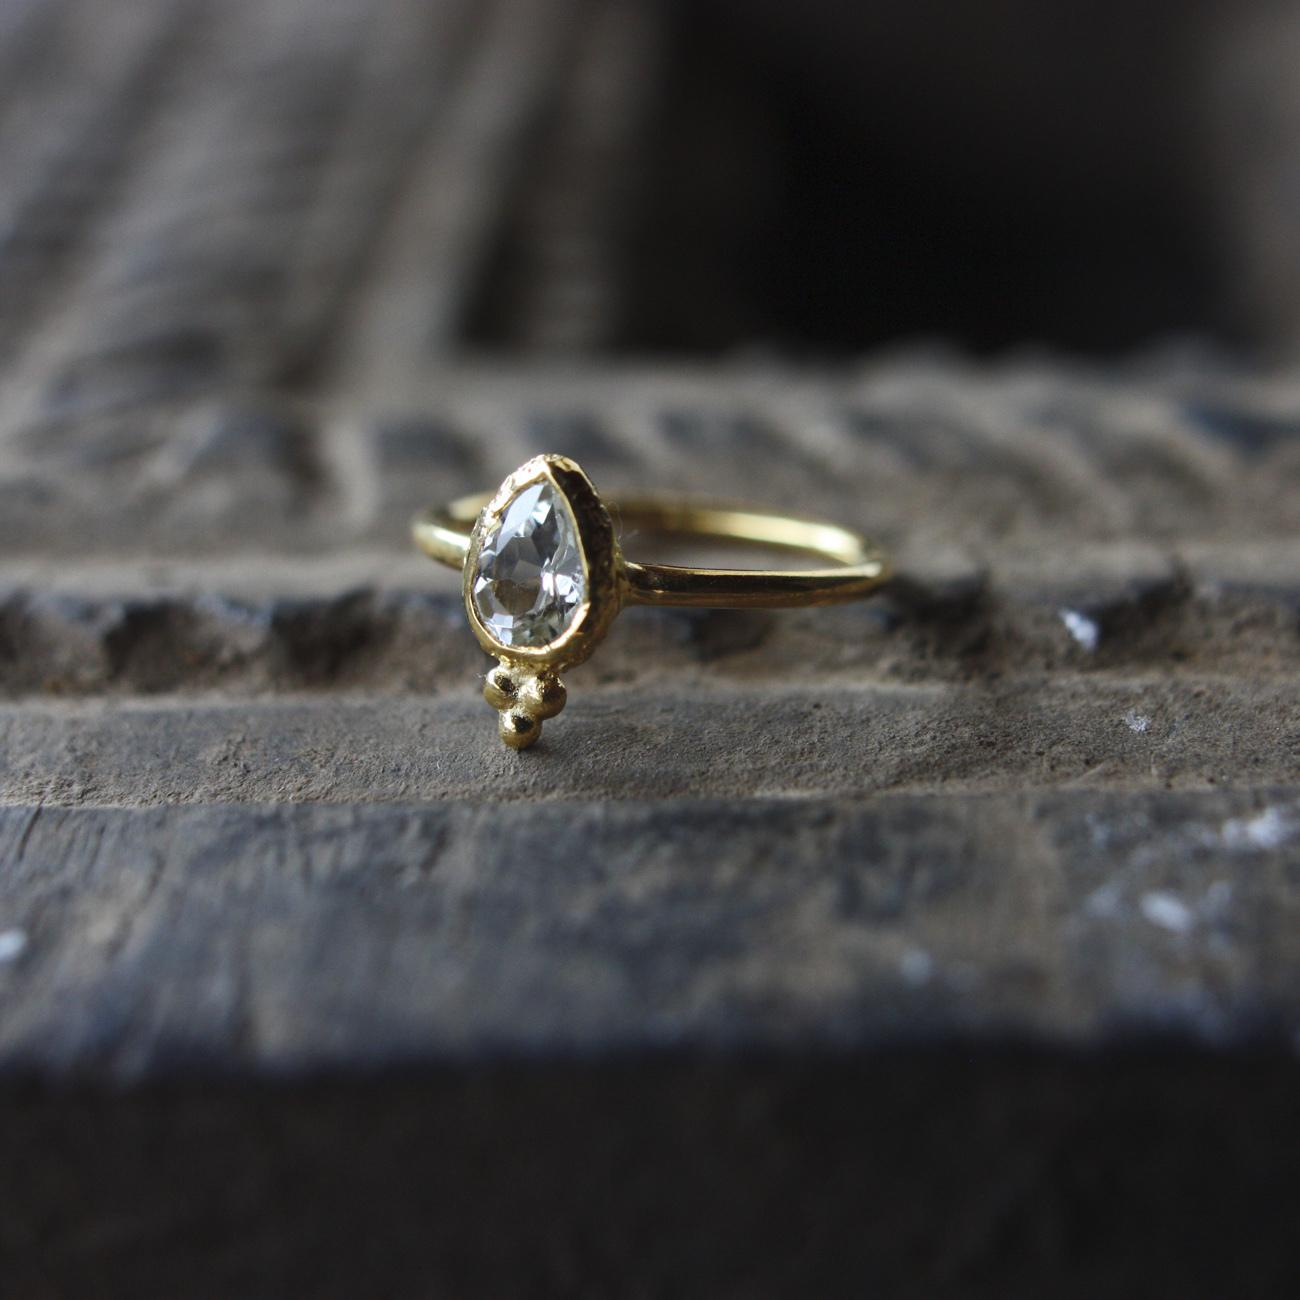 Jaipur gem リング -crystal- #7